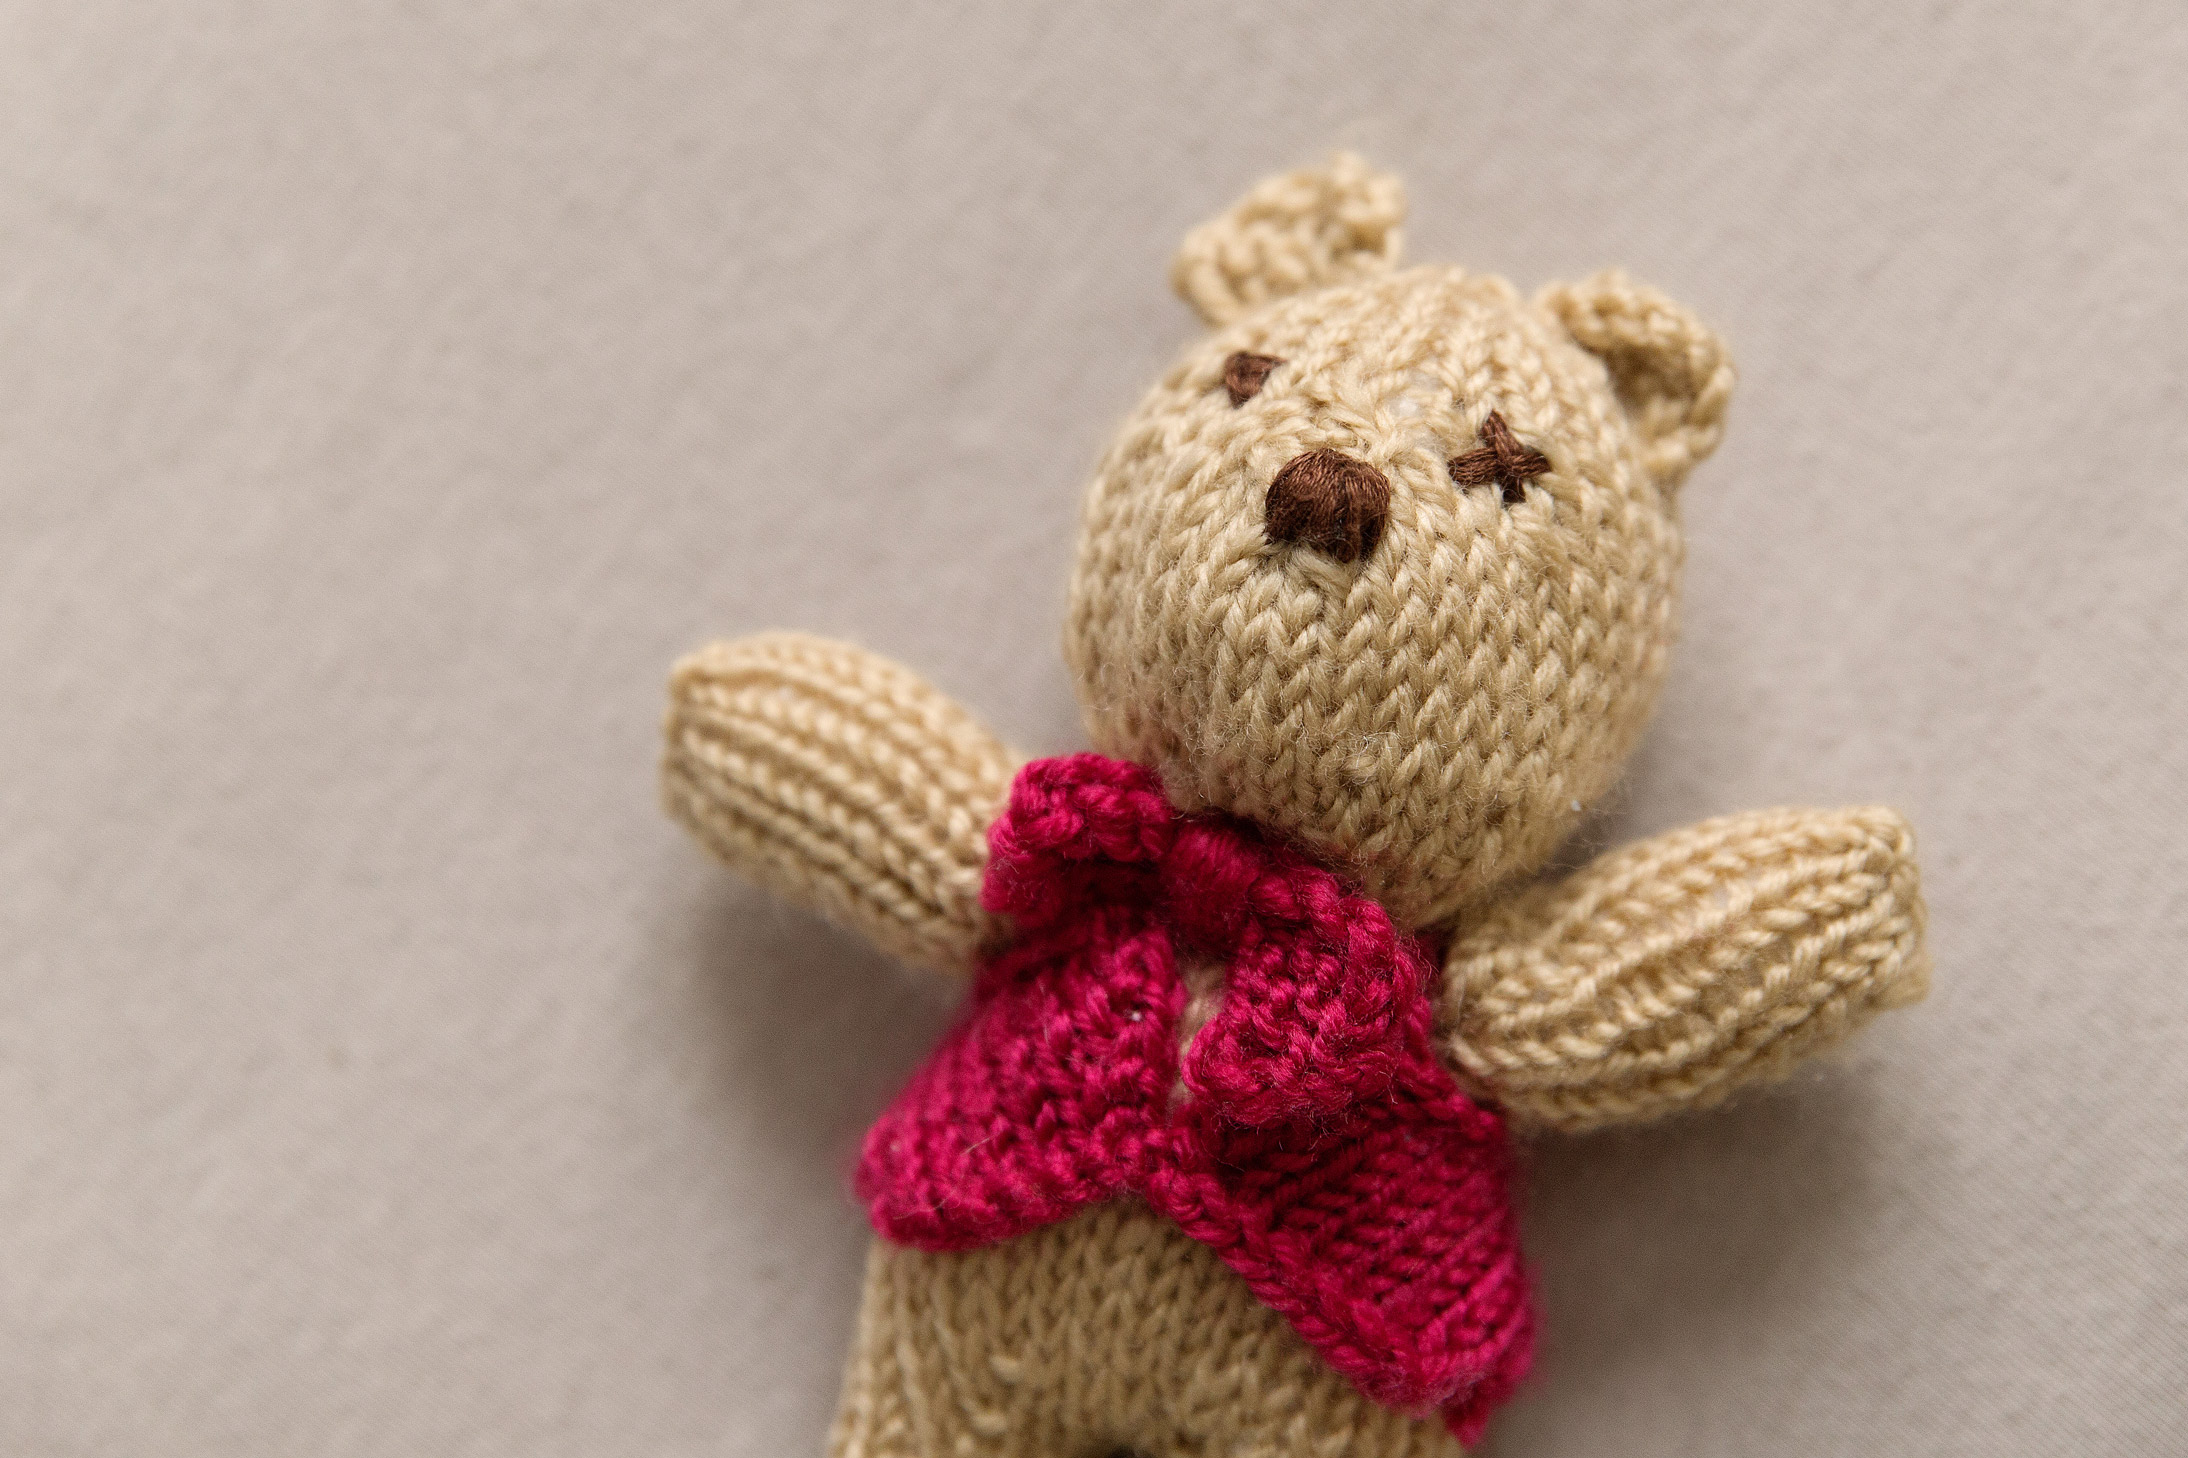 newborn-photos-st-albans-props-teddy-bear.jpg